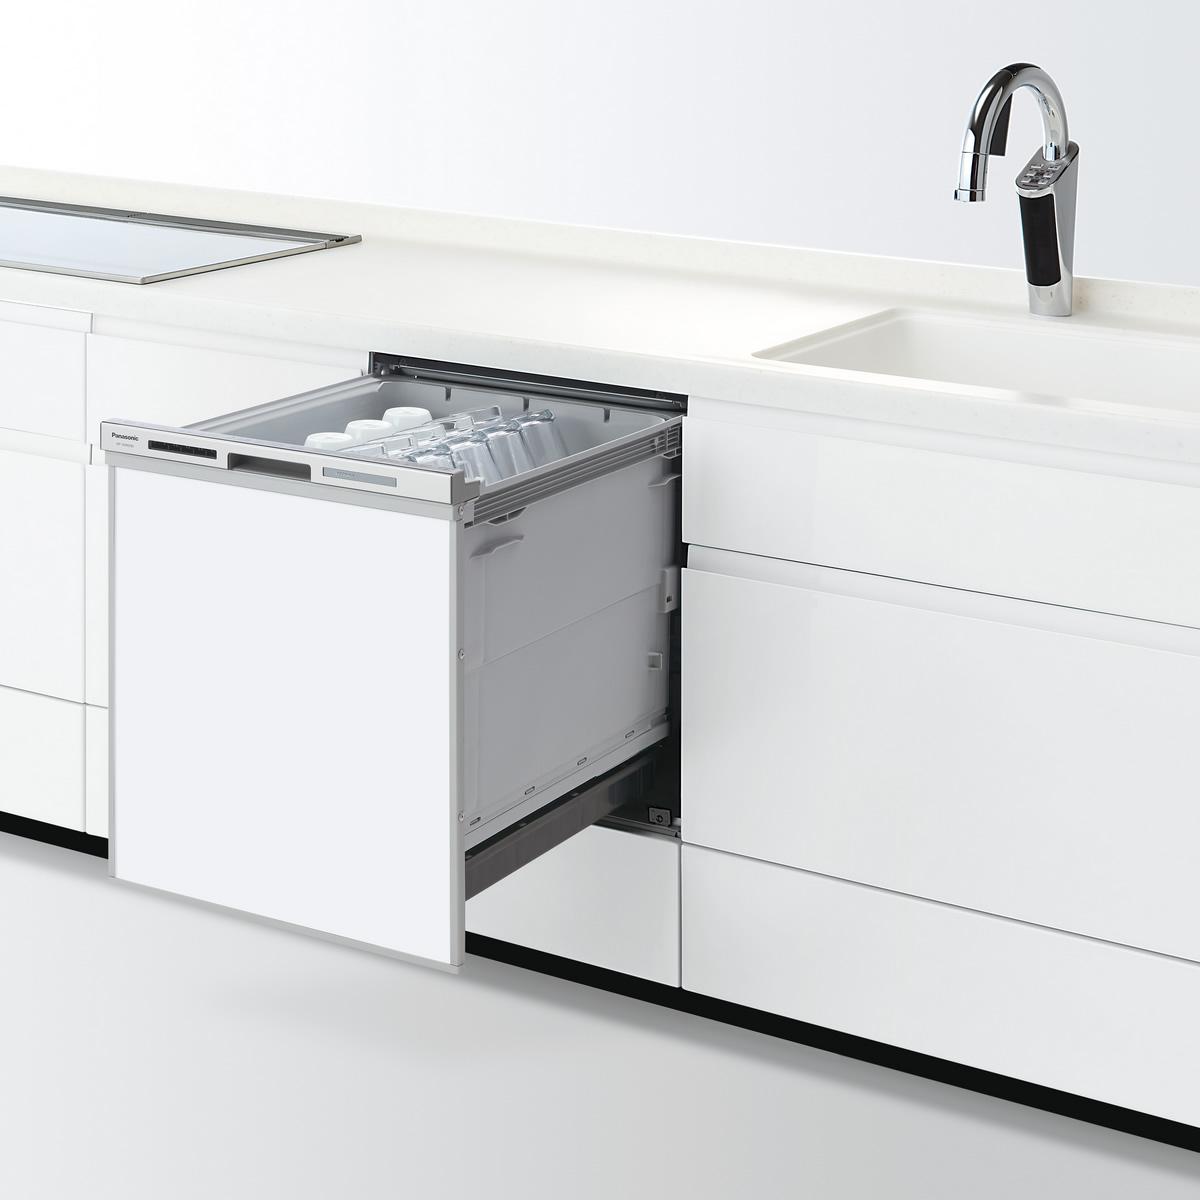 【NP-45MD8S】 パナソニック ビルトイン食器洗い乾燥機(食洗機) M8シリーズ 幅45cm ディープタイプ ドアパネル型 シルバー